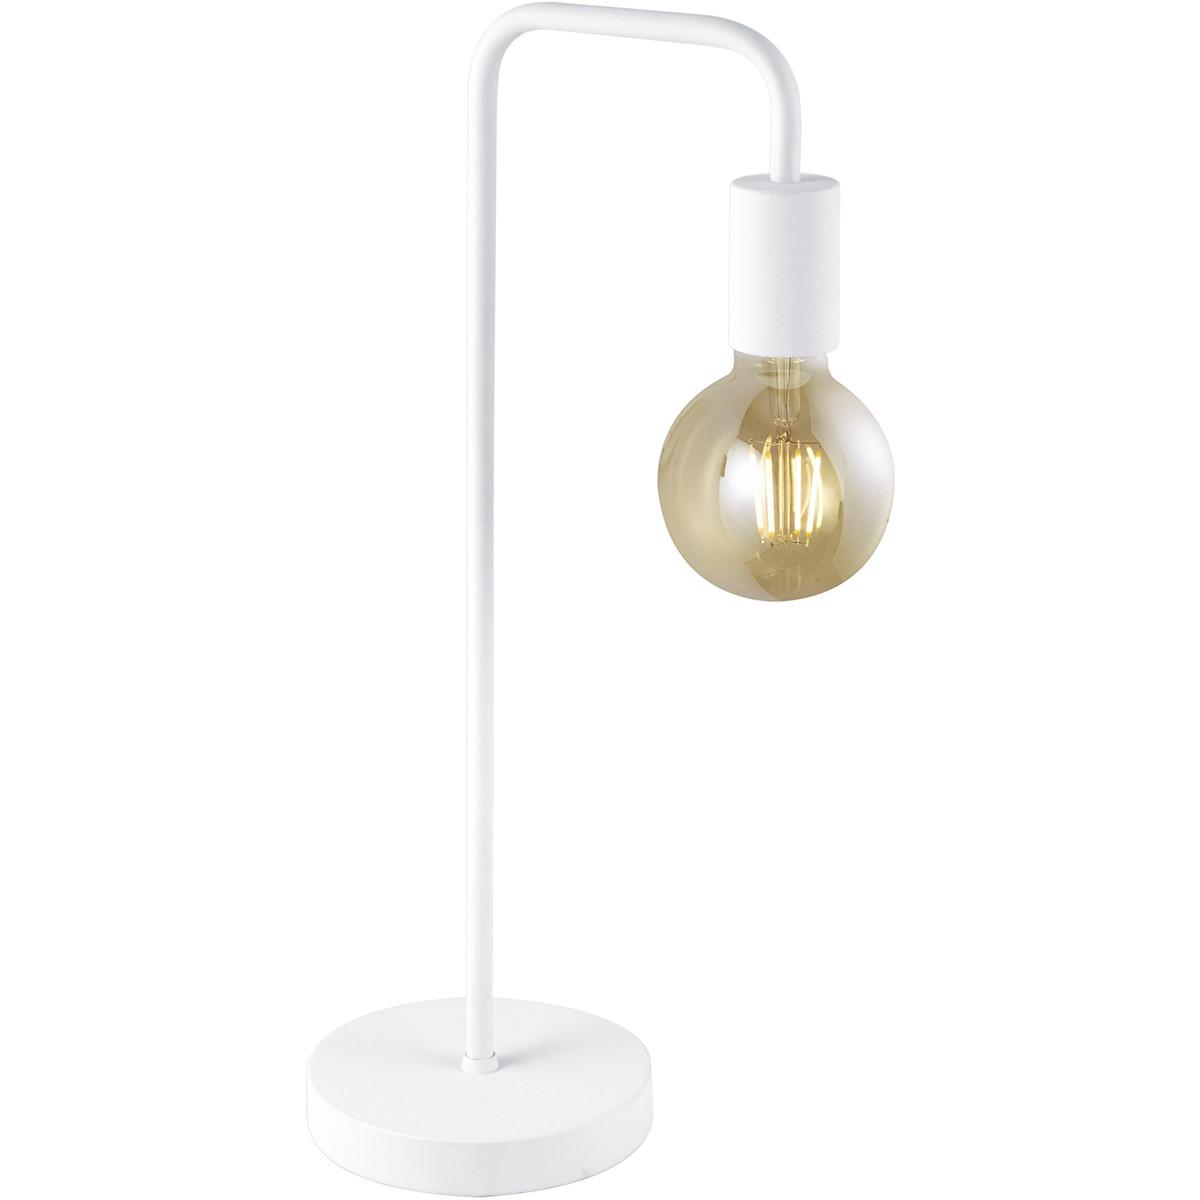 LED Tafellamp - Trion Dolla - E27 Fitting - Rond - Mat Wit - Aluminium